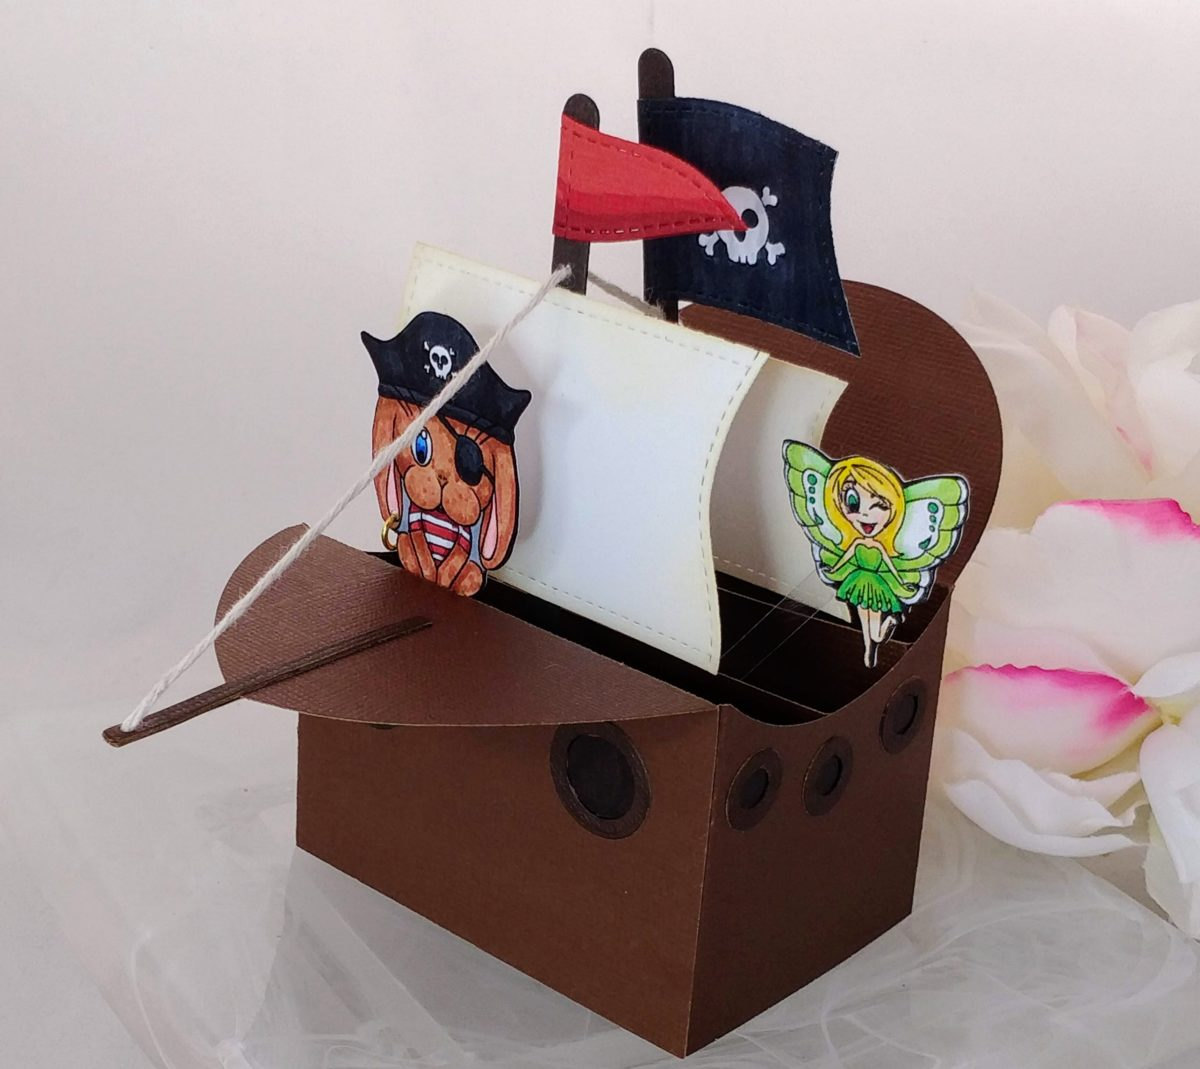 Pirate Ship Pop-Up Card